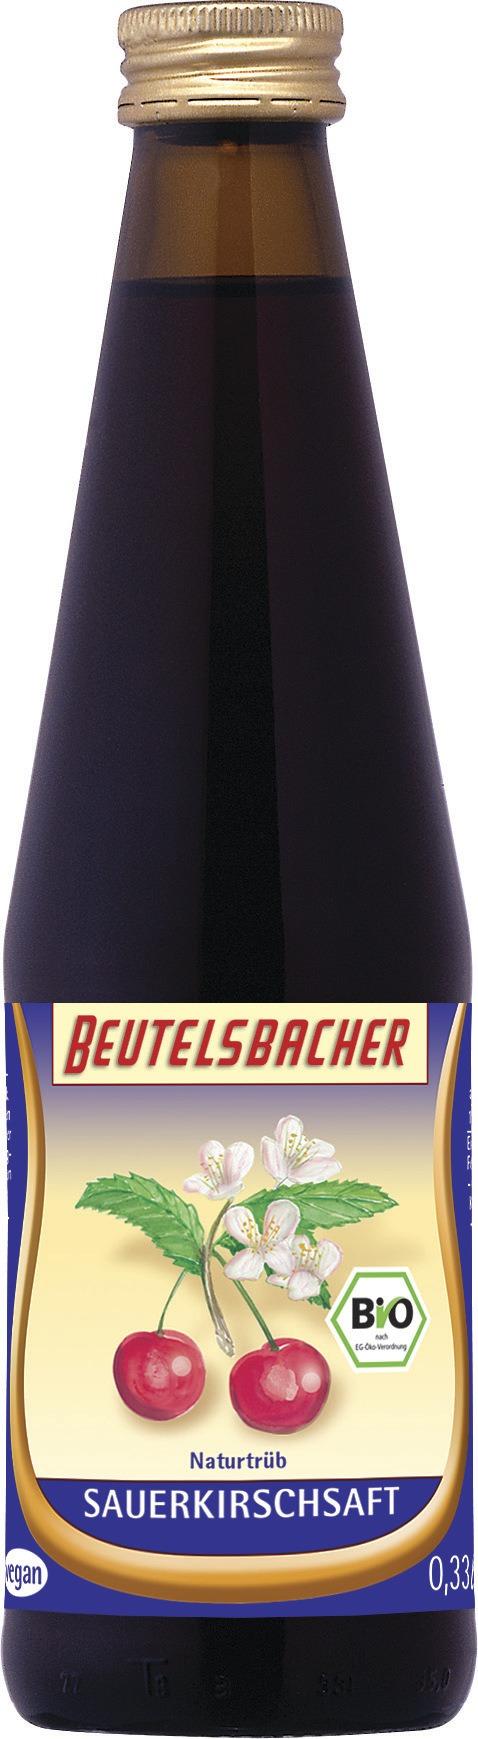 BEUTELSBACHER Bio Sauerkirschsaft naturtrüber Direktsaft 12x0,33l